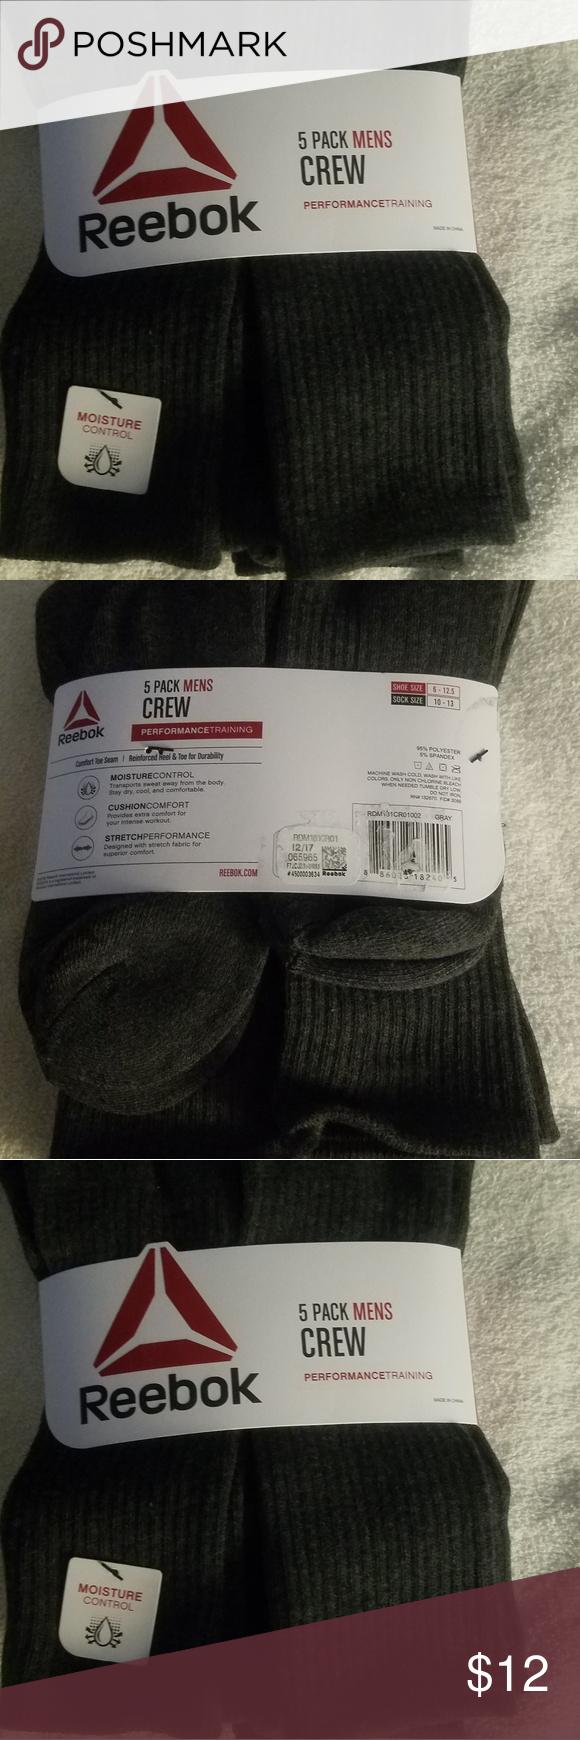 Men Socks Nwt With Images Mens Socks Men Grey Socks